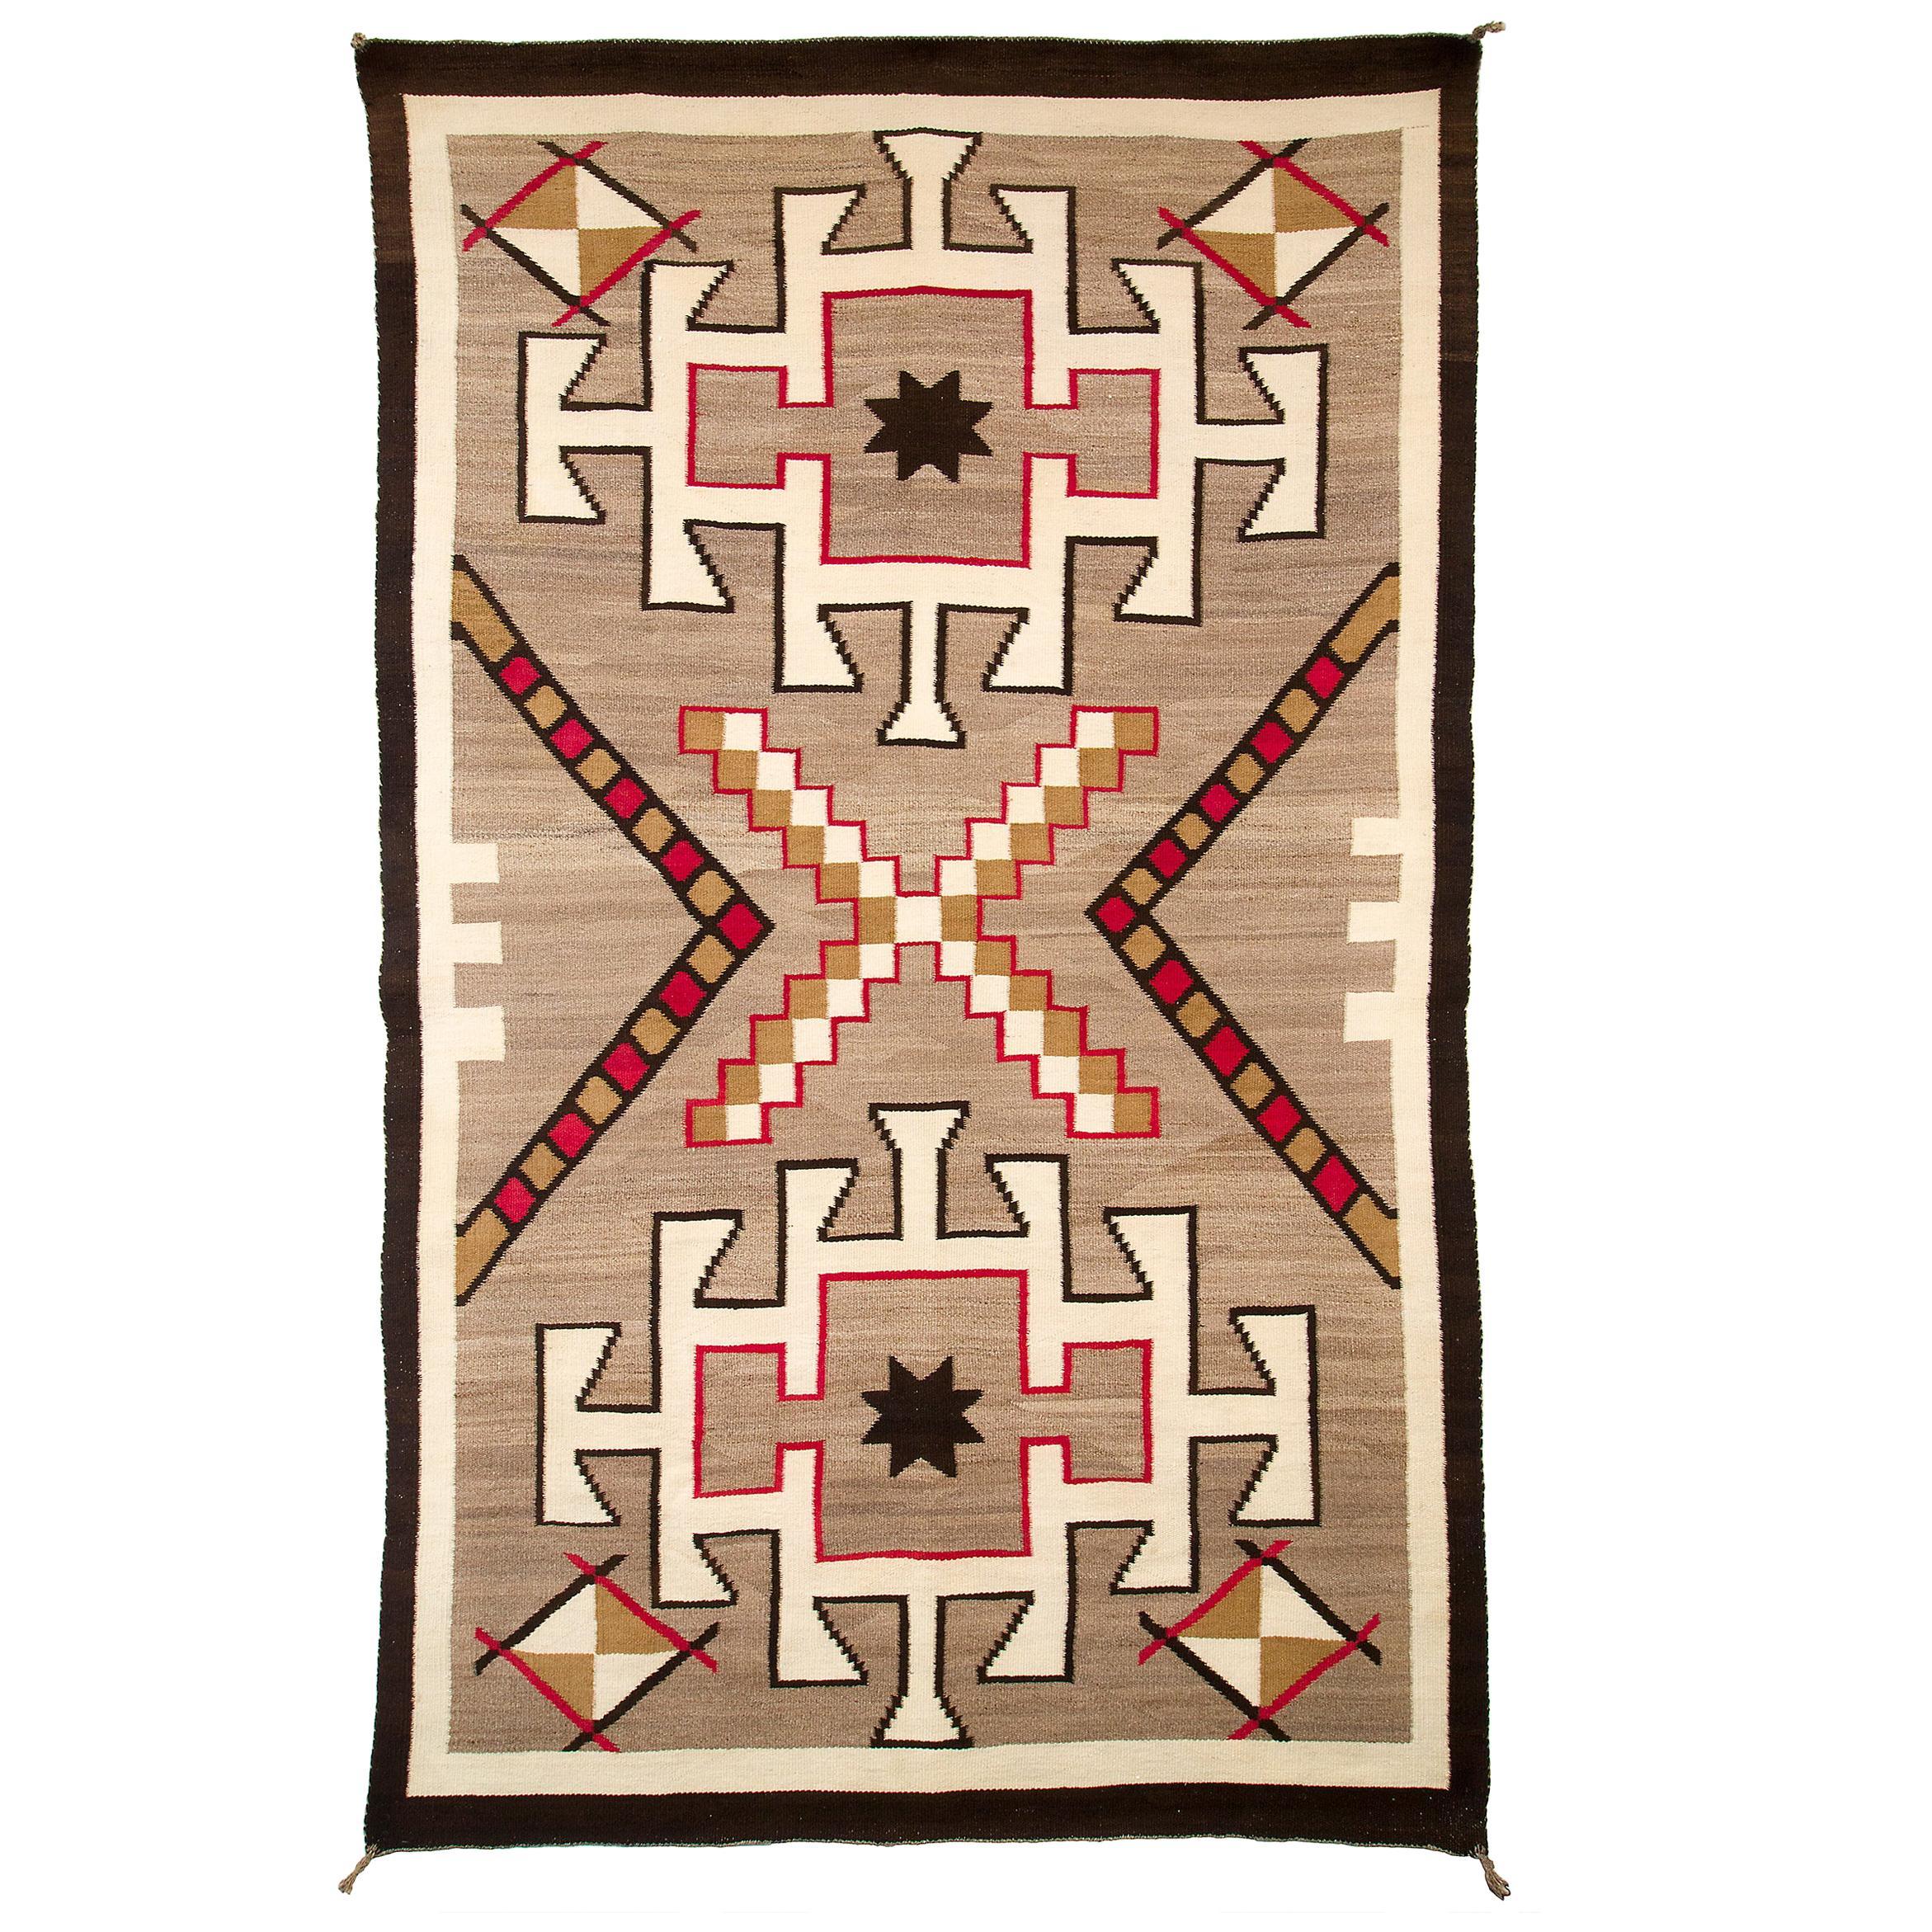 Vintage Navajo Area Rug, Trading Post Era, circa 1930s, Brown, White, Red, Black